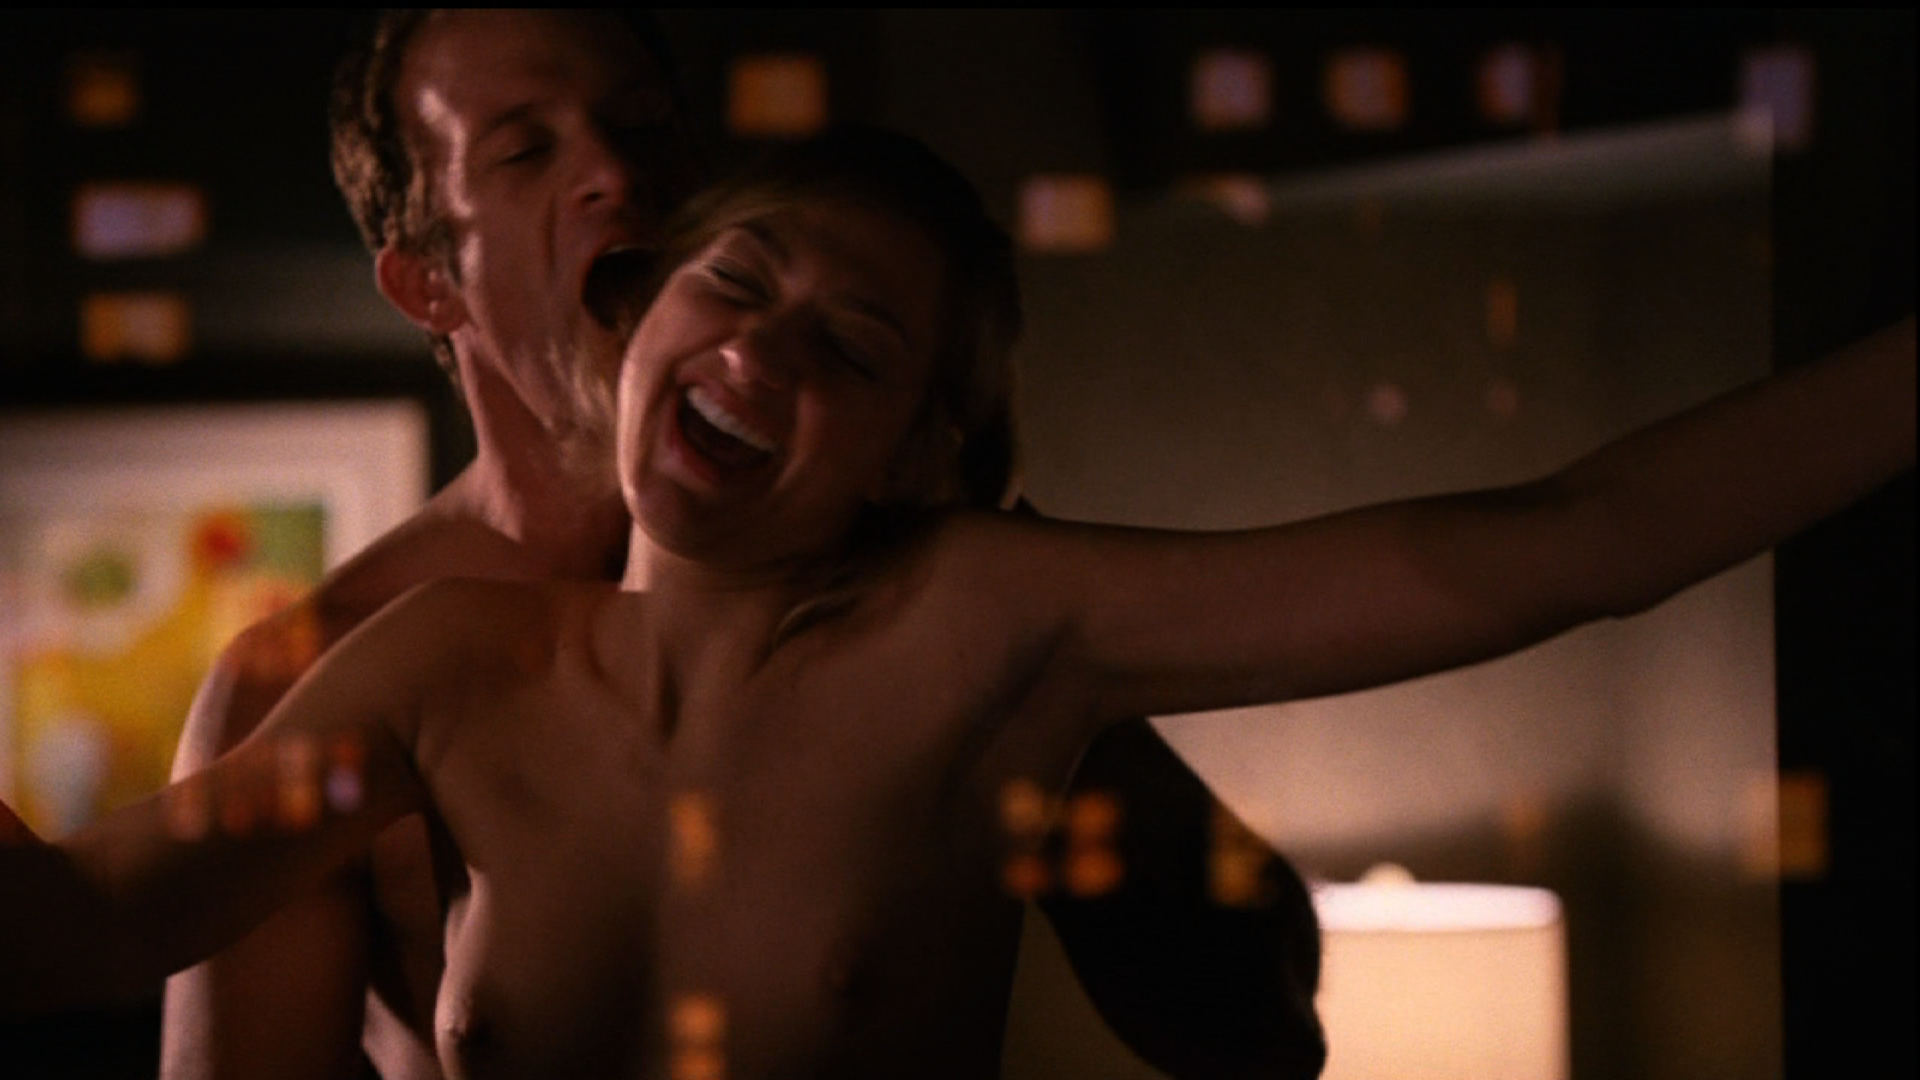 Annie parisse rosemarie de witt and zette sullivan nude boo - 5 4